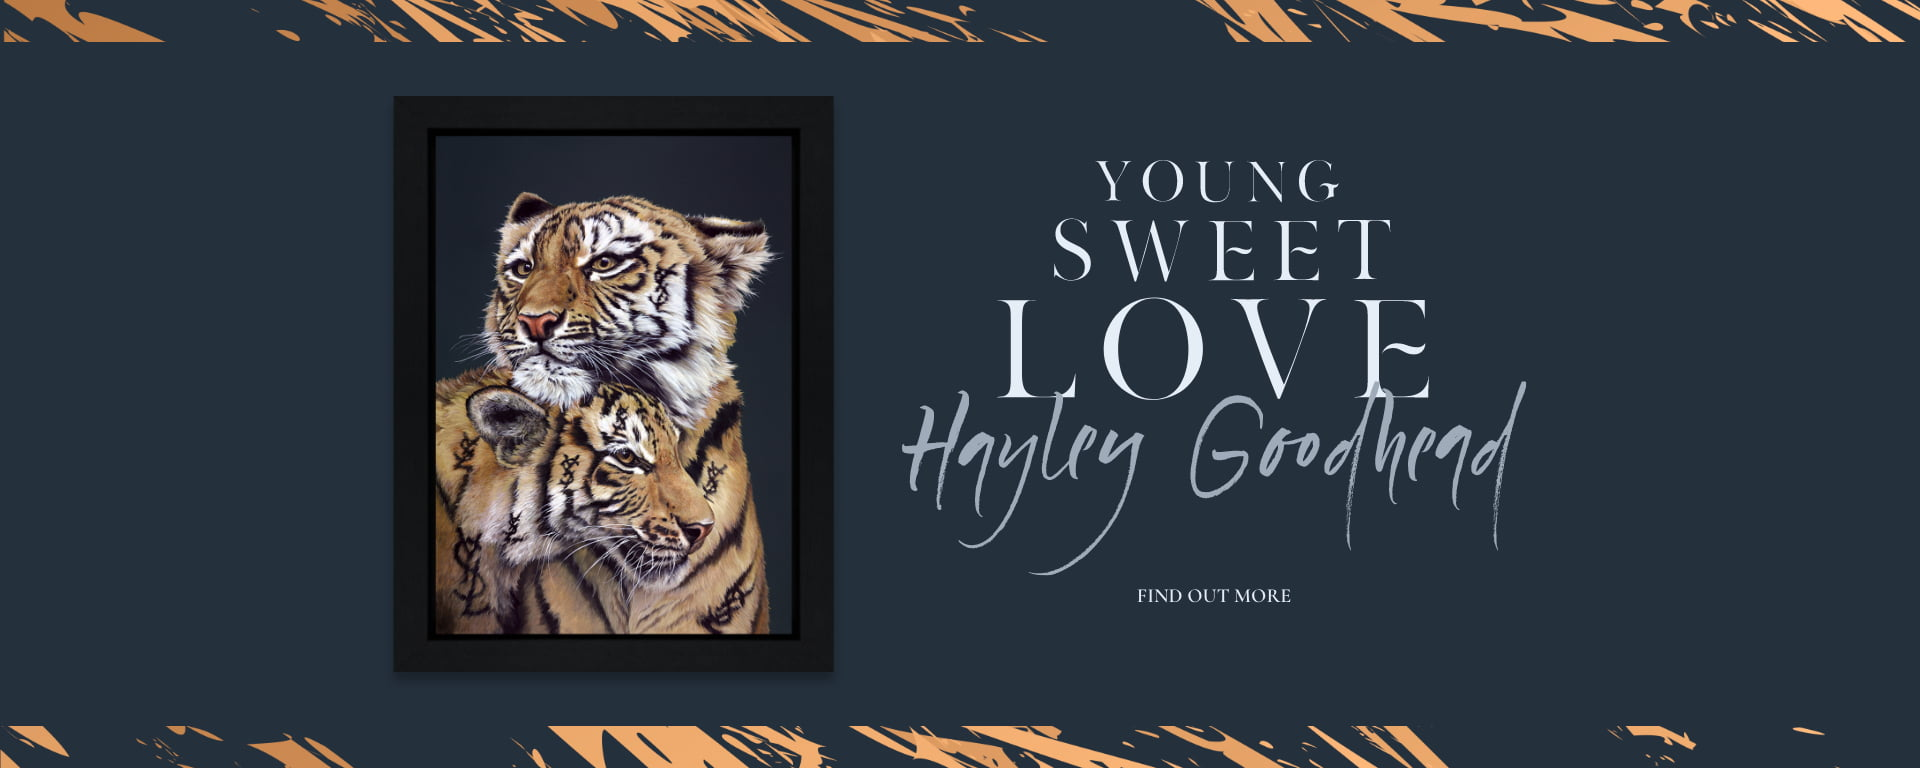 Hayley Goodhead – Young Sweet Love